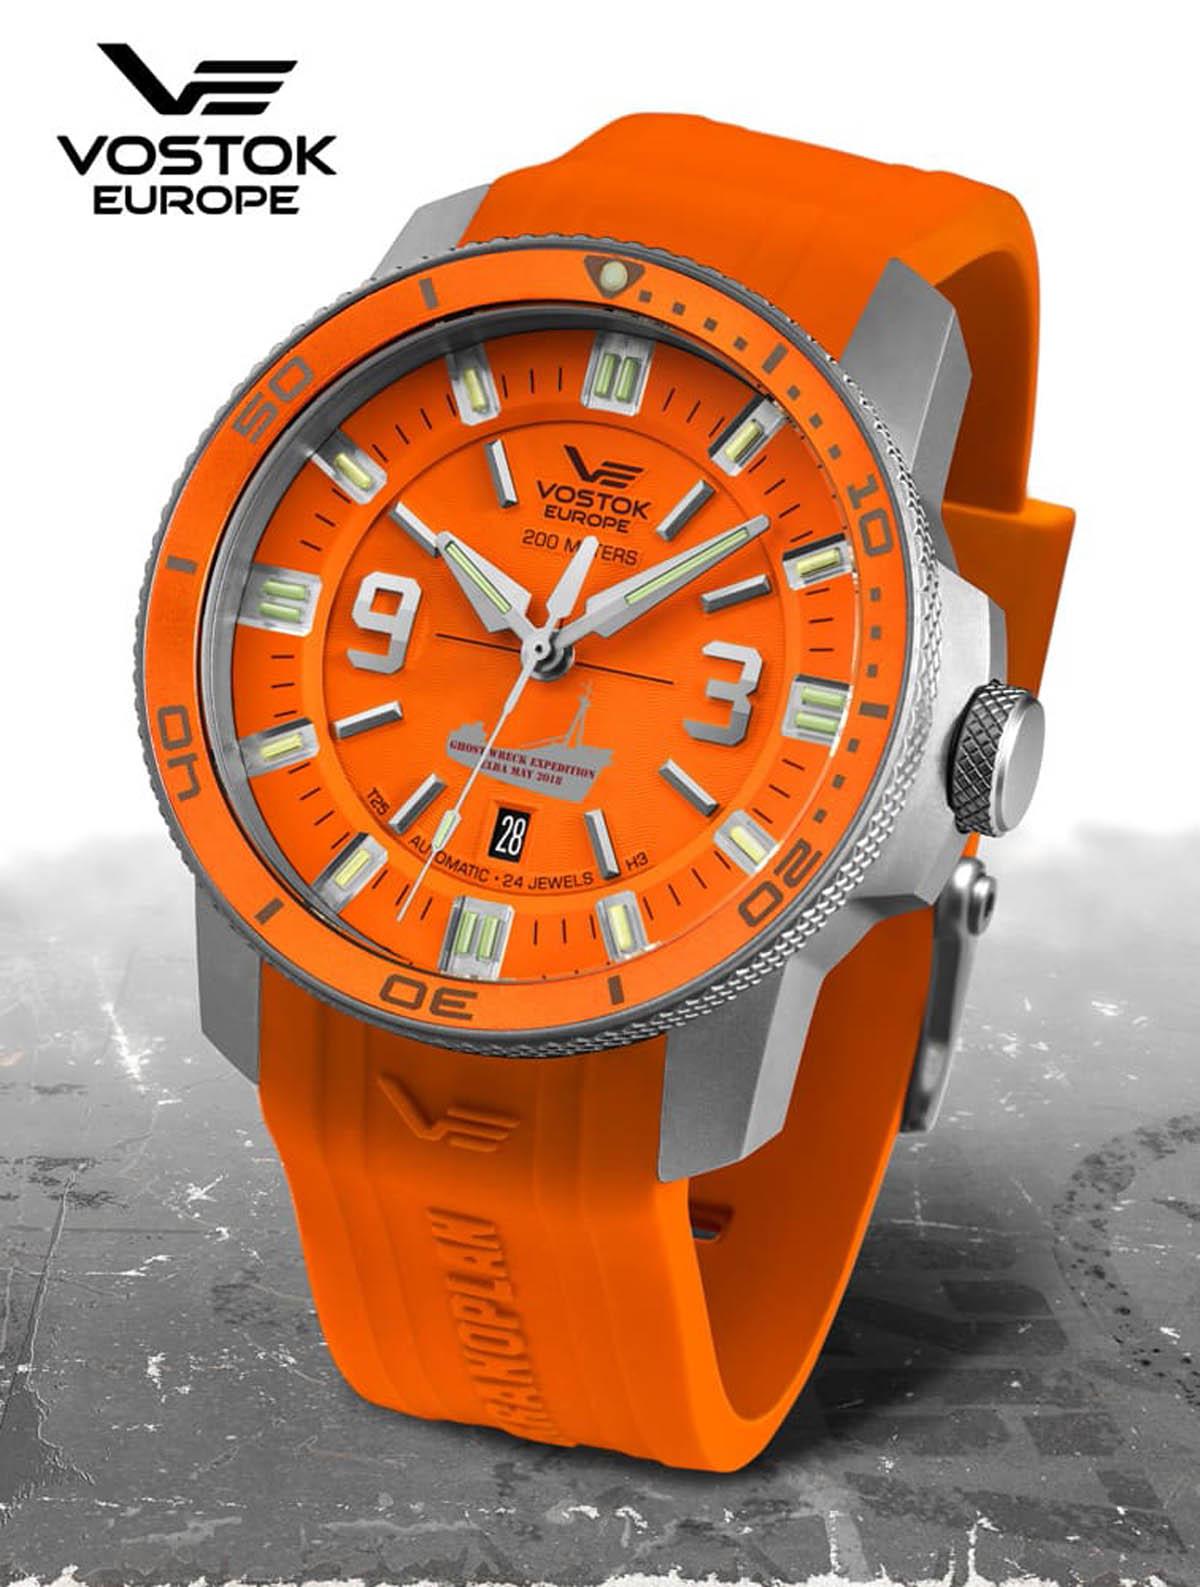 Uhrenonline24 EkranoplanVostok Uhren Europe EkranoplanVostok Europe EkranoplanVostok Uhren Uhrenonline24 D9IW2EH